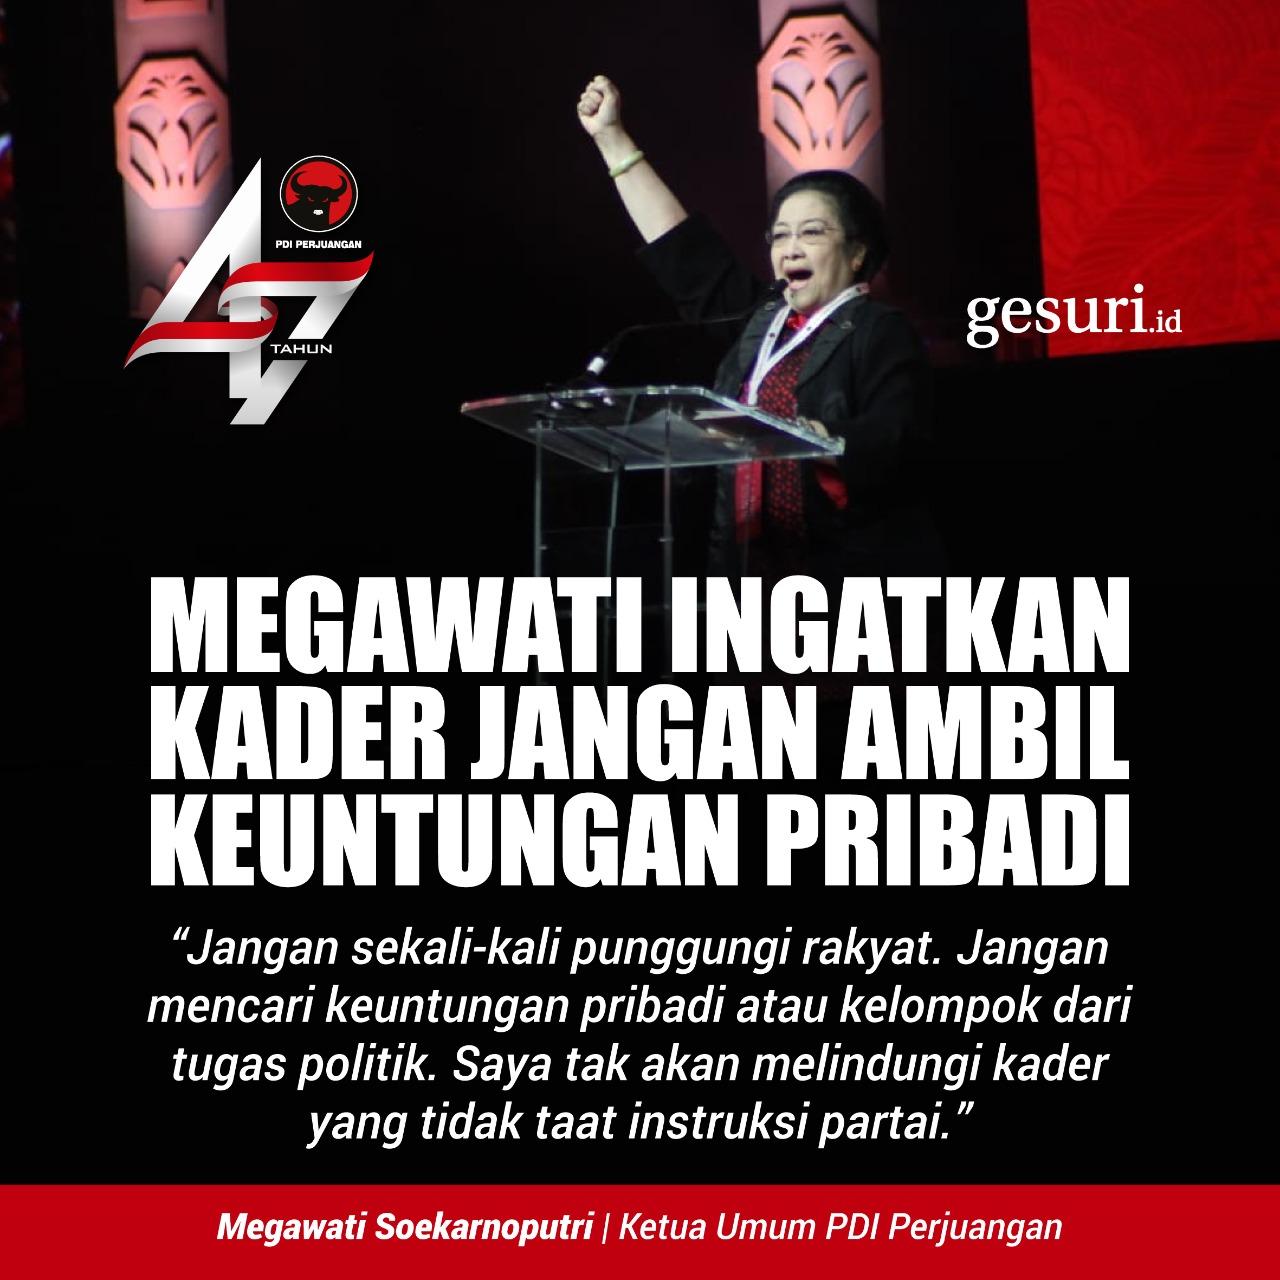 Megawati Ingatkan Kader Jangan Ambil Keuntungan Pribadi